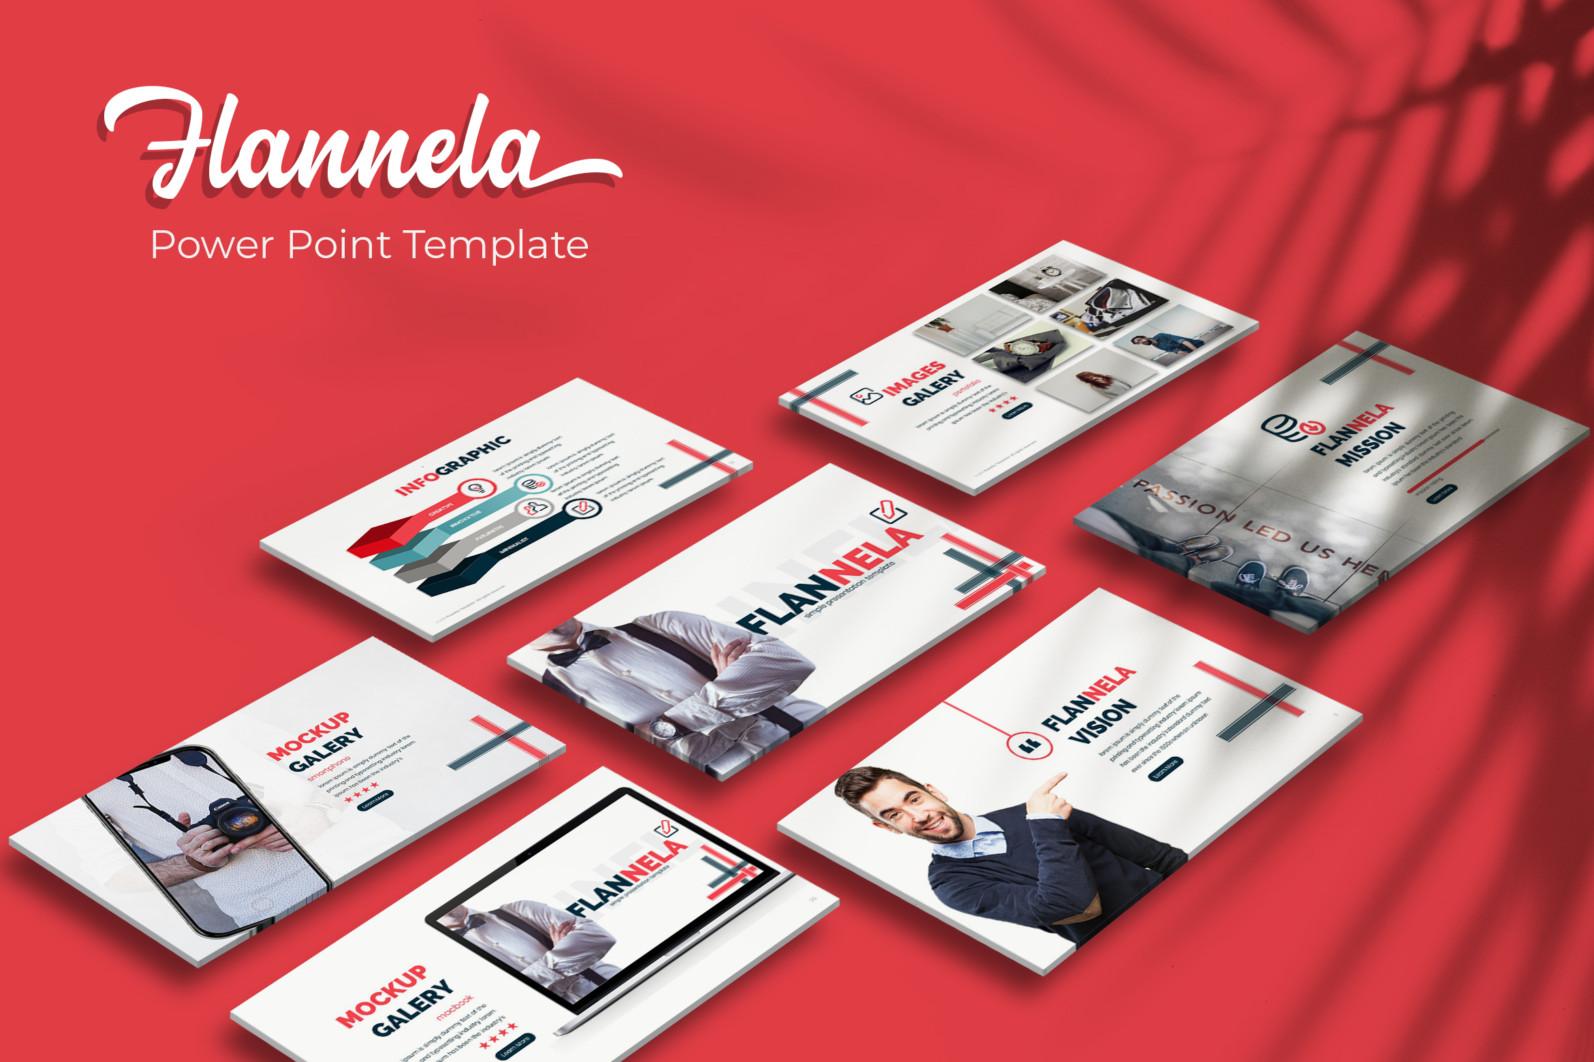 Flannela Power Point Template - Flannela PowerPoint Template -